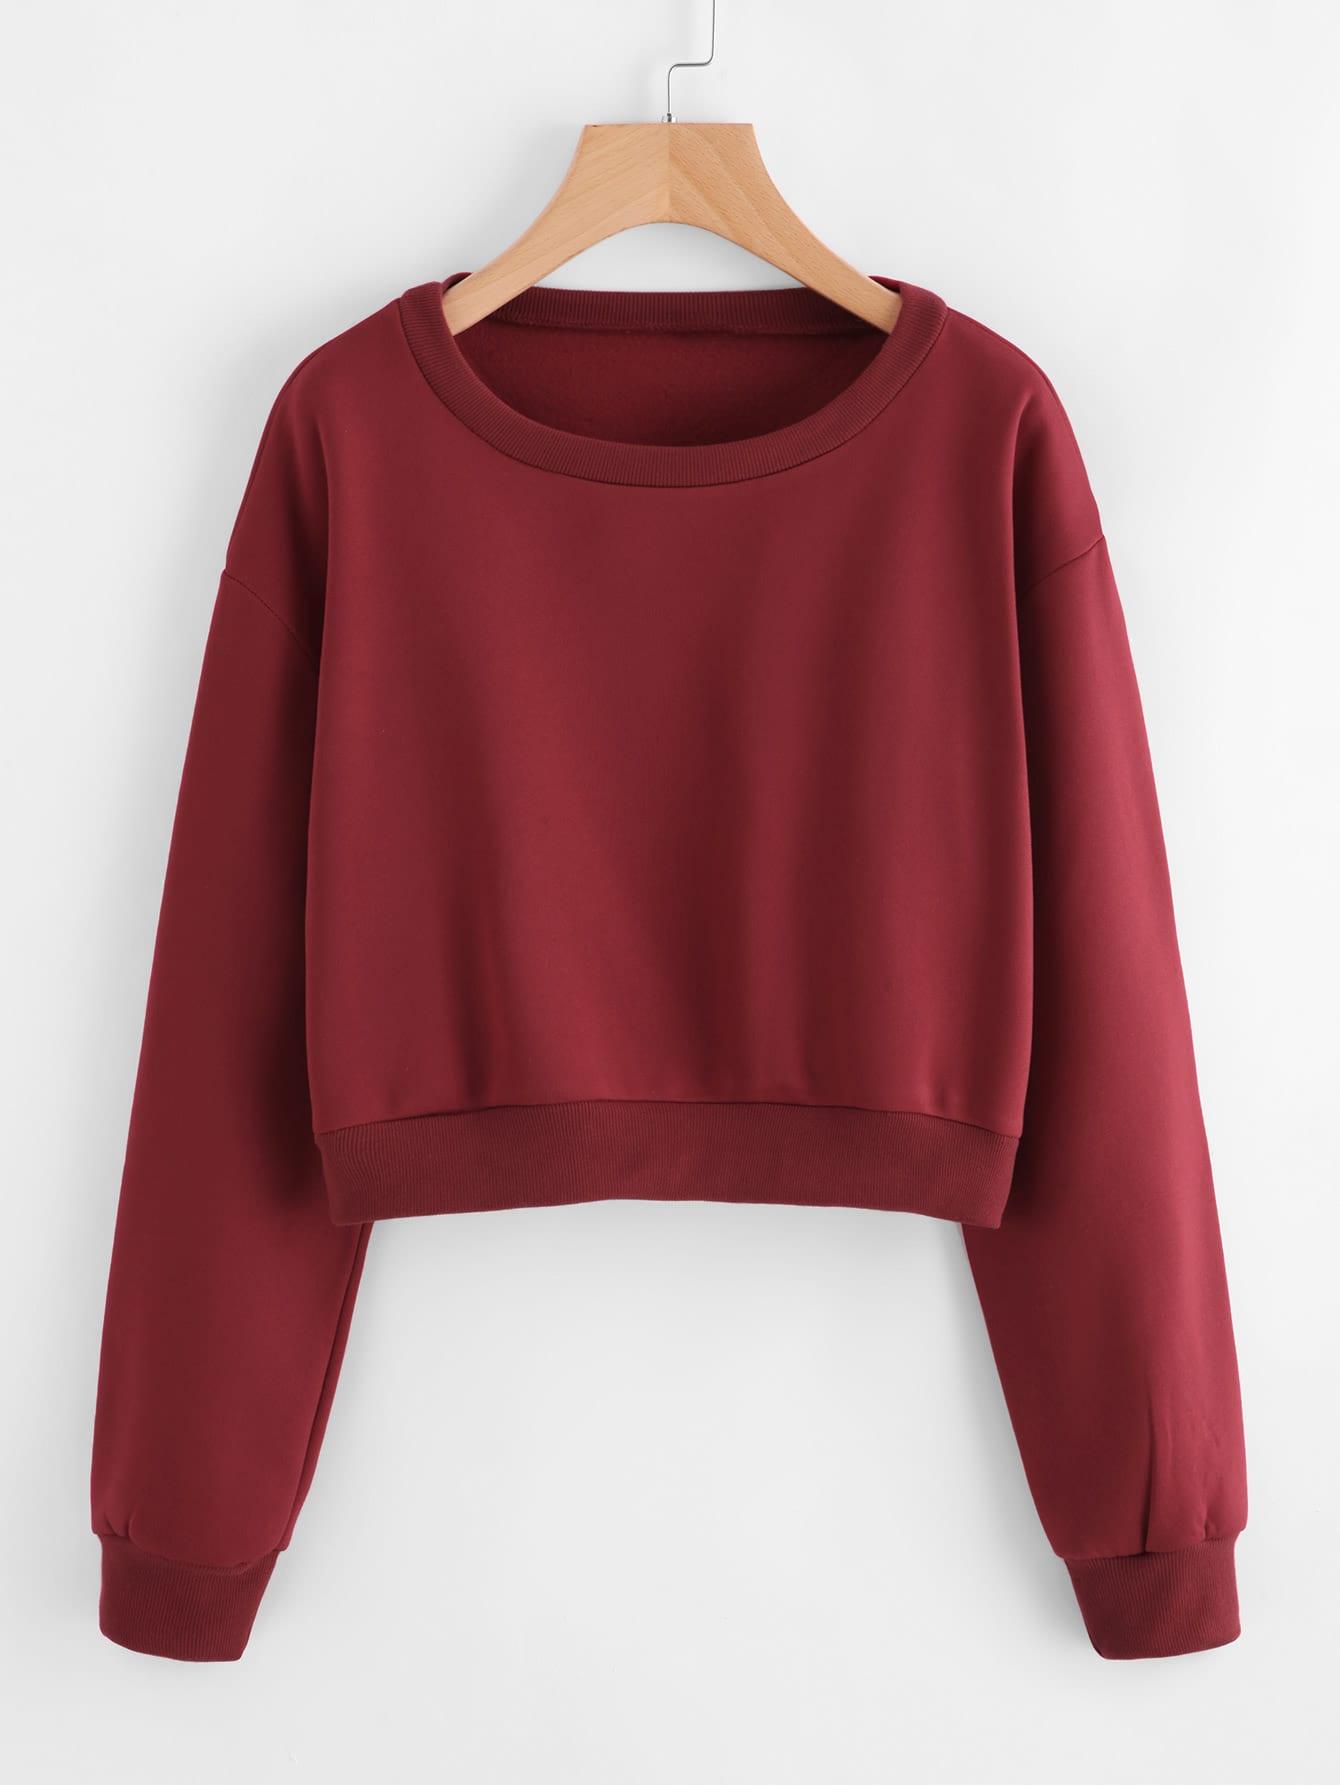 Drop Shoulder Ribbed Trim Crop Pullover sweatshirt170925102